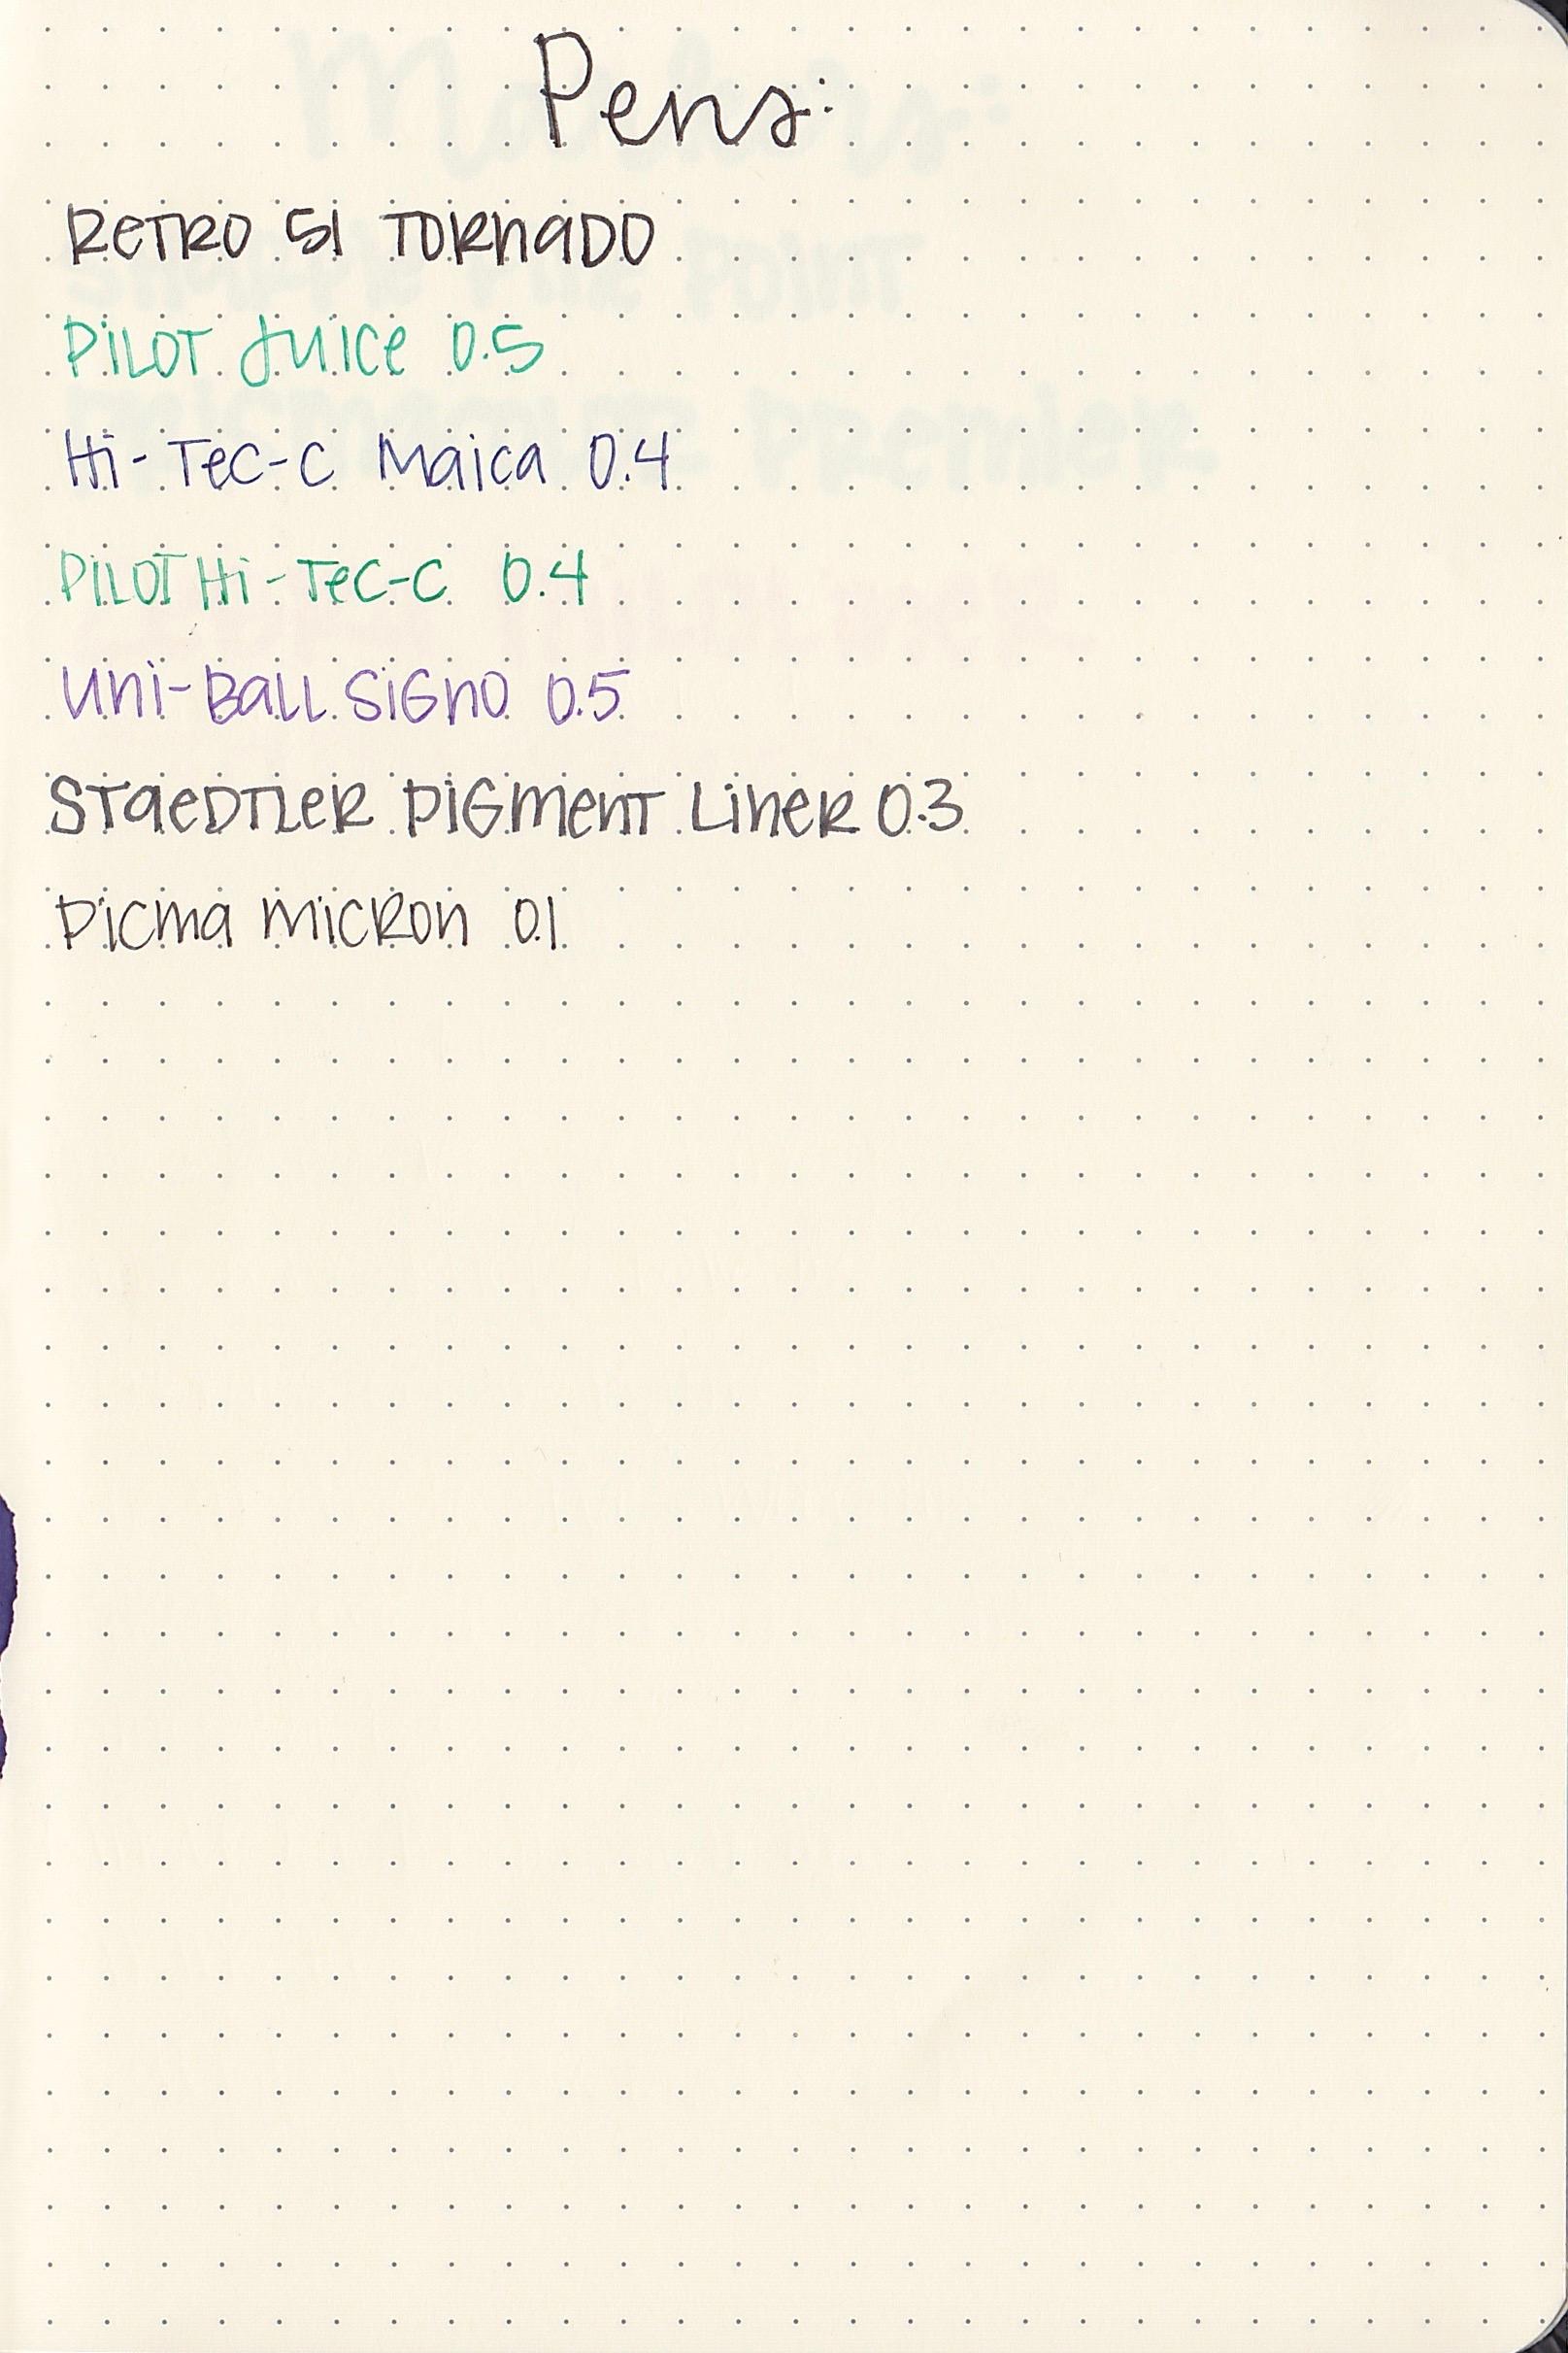 RhodiaWebnotebook2 - 6.jpg